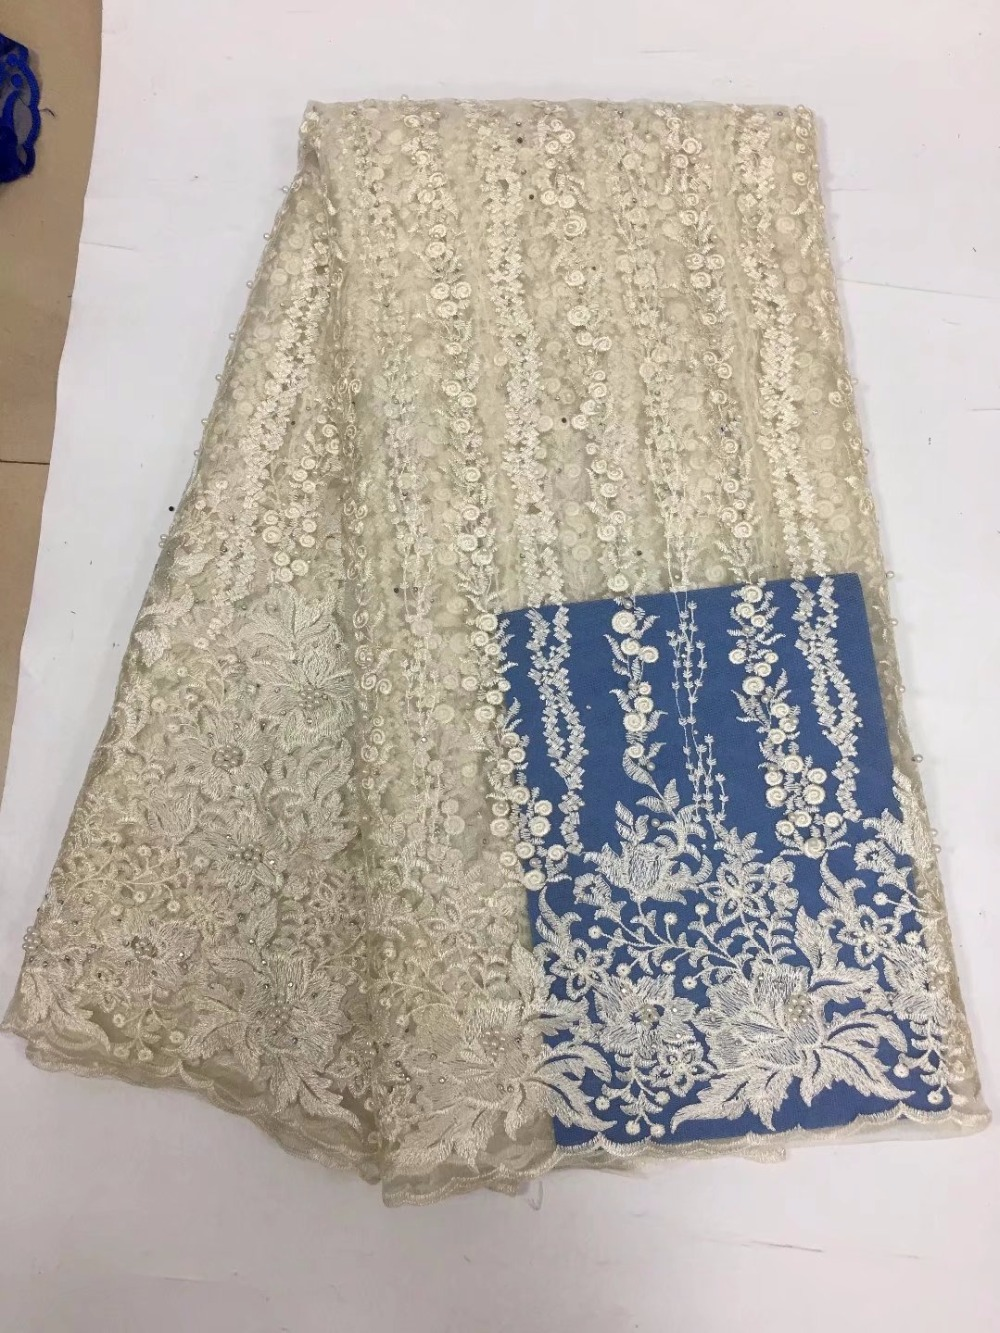 Belo tule tecido de renda líquida africano com contas de alta qualidade tecido laço francês africano para o vestido de casamento yda082 - 3